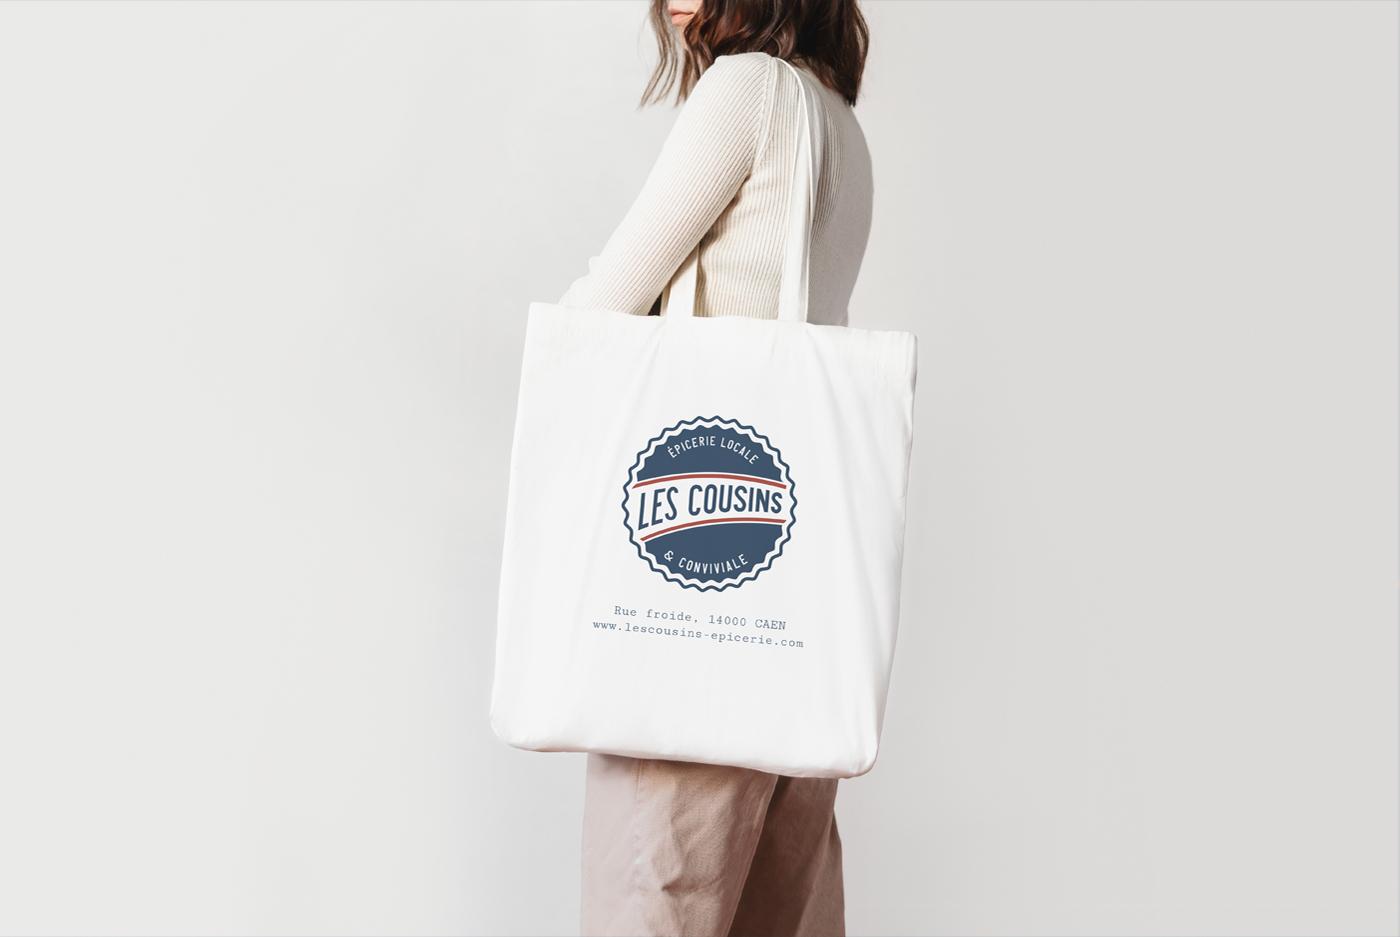 Les Cousins logo tote bag - Mathieu Dupuis freelance